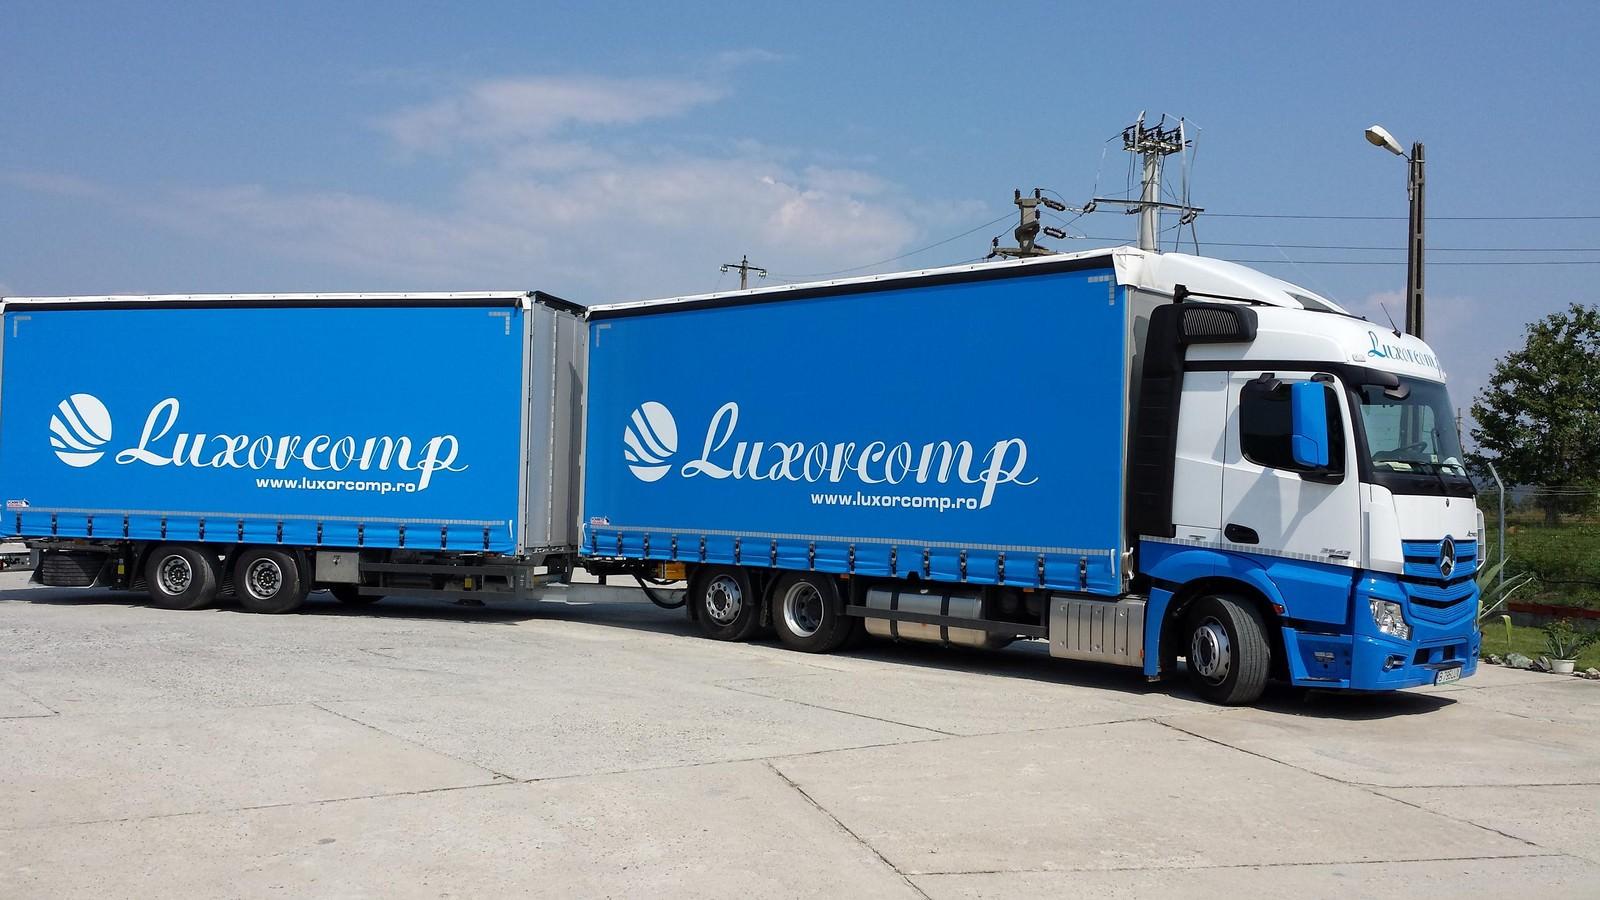 Mercedes-Benz România a livrat 25 de camioane companiei de transport Luxorcomp